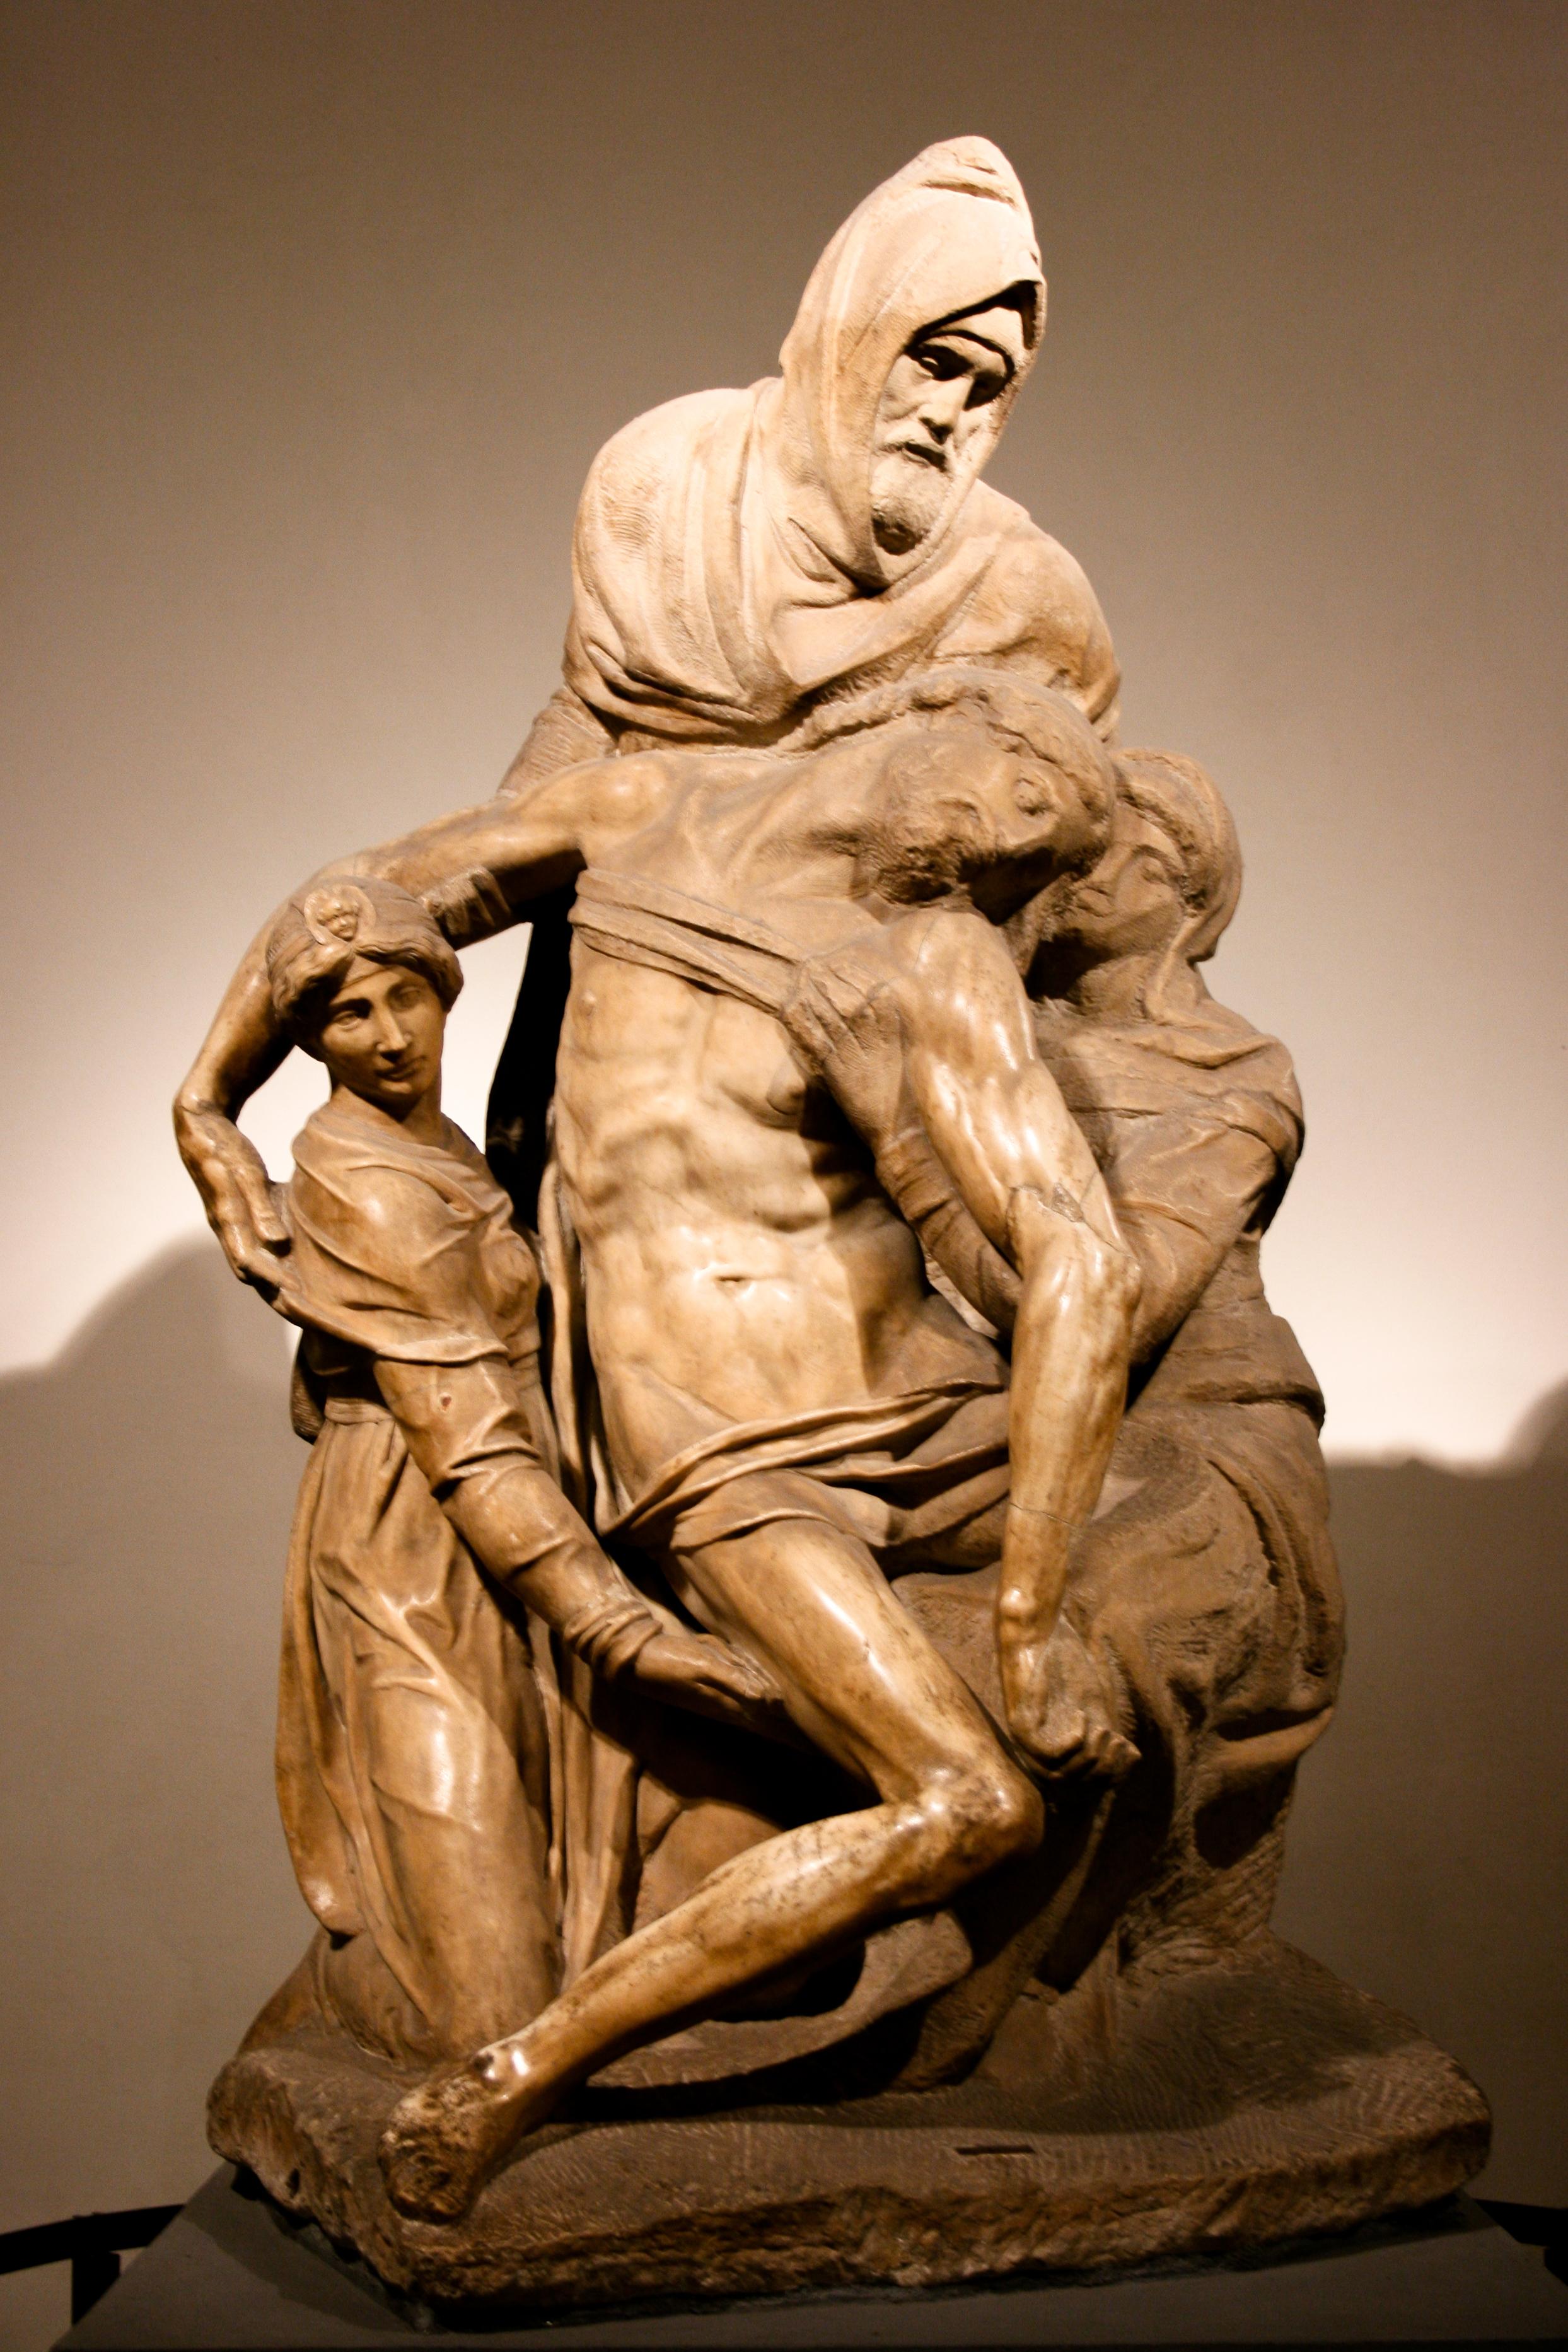 The Florentine Pieta | Michelangelo Buonarroti | Opera del Duomo, Florence